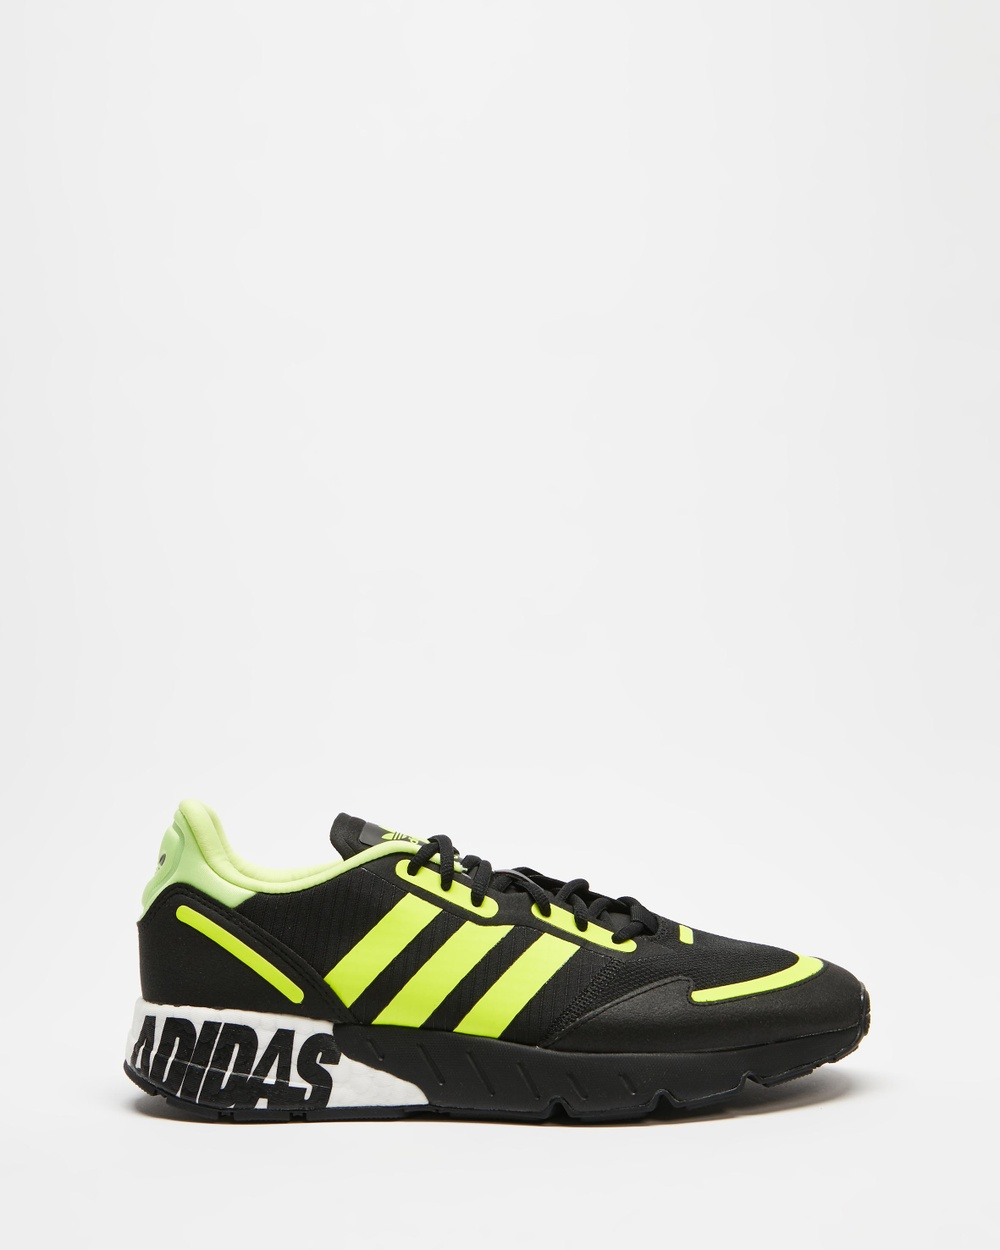 adidas Originals ZX 1K Boost Sneakers Men's Lifestyle Core Black, Solar Yellow & Matte Silver